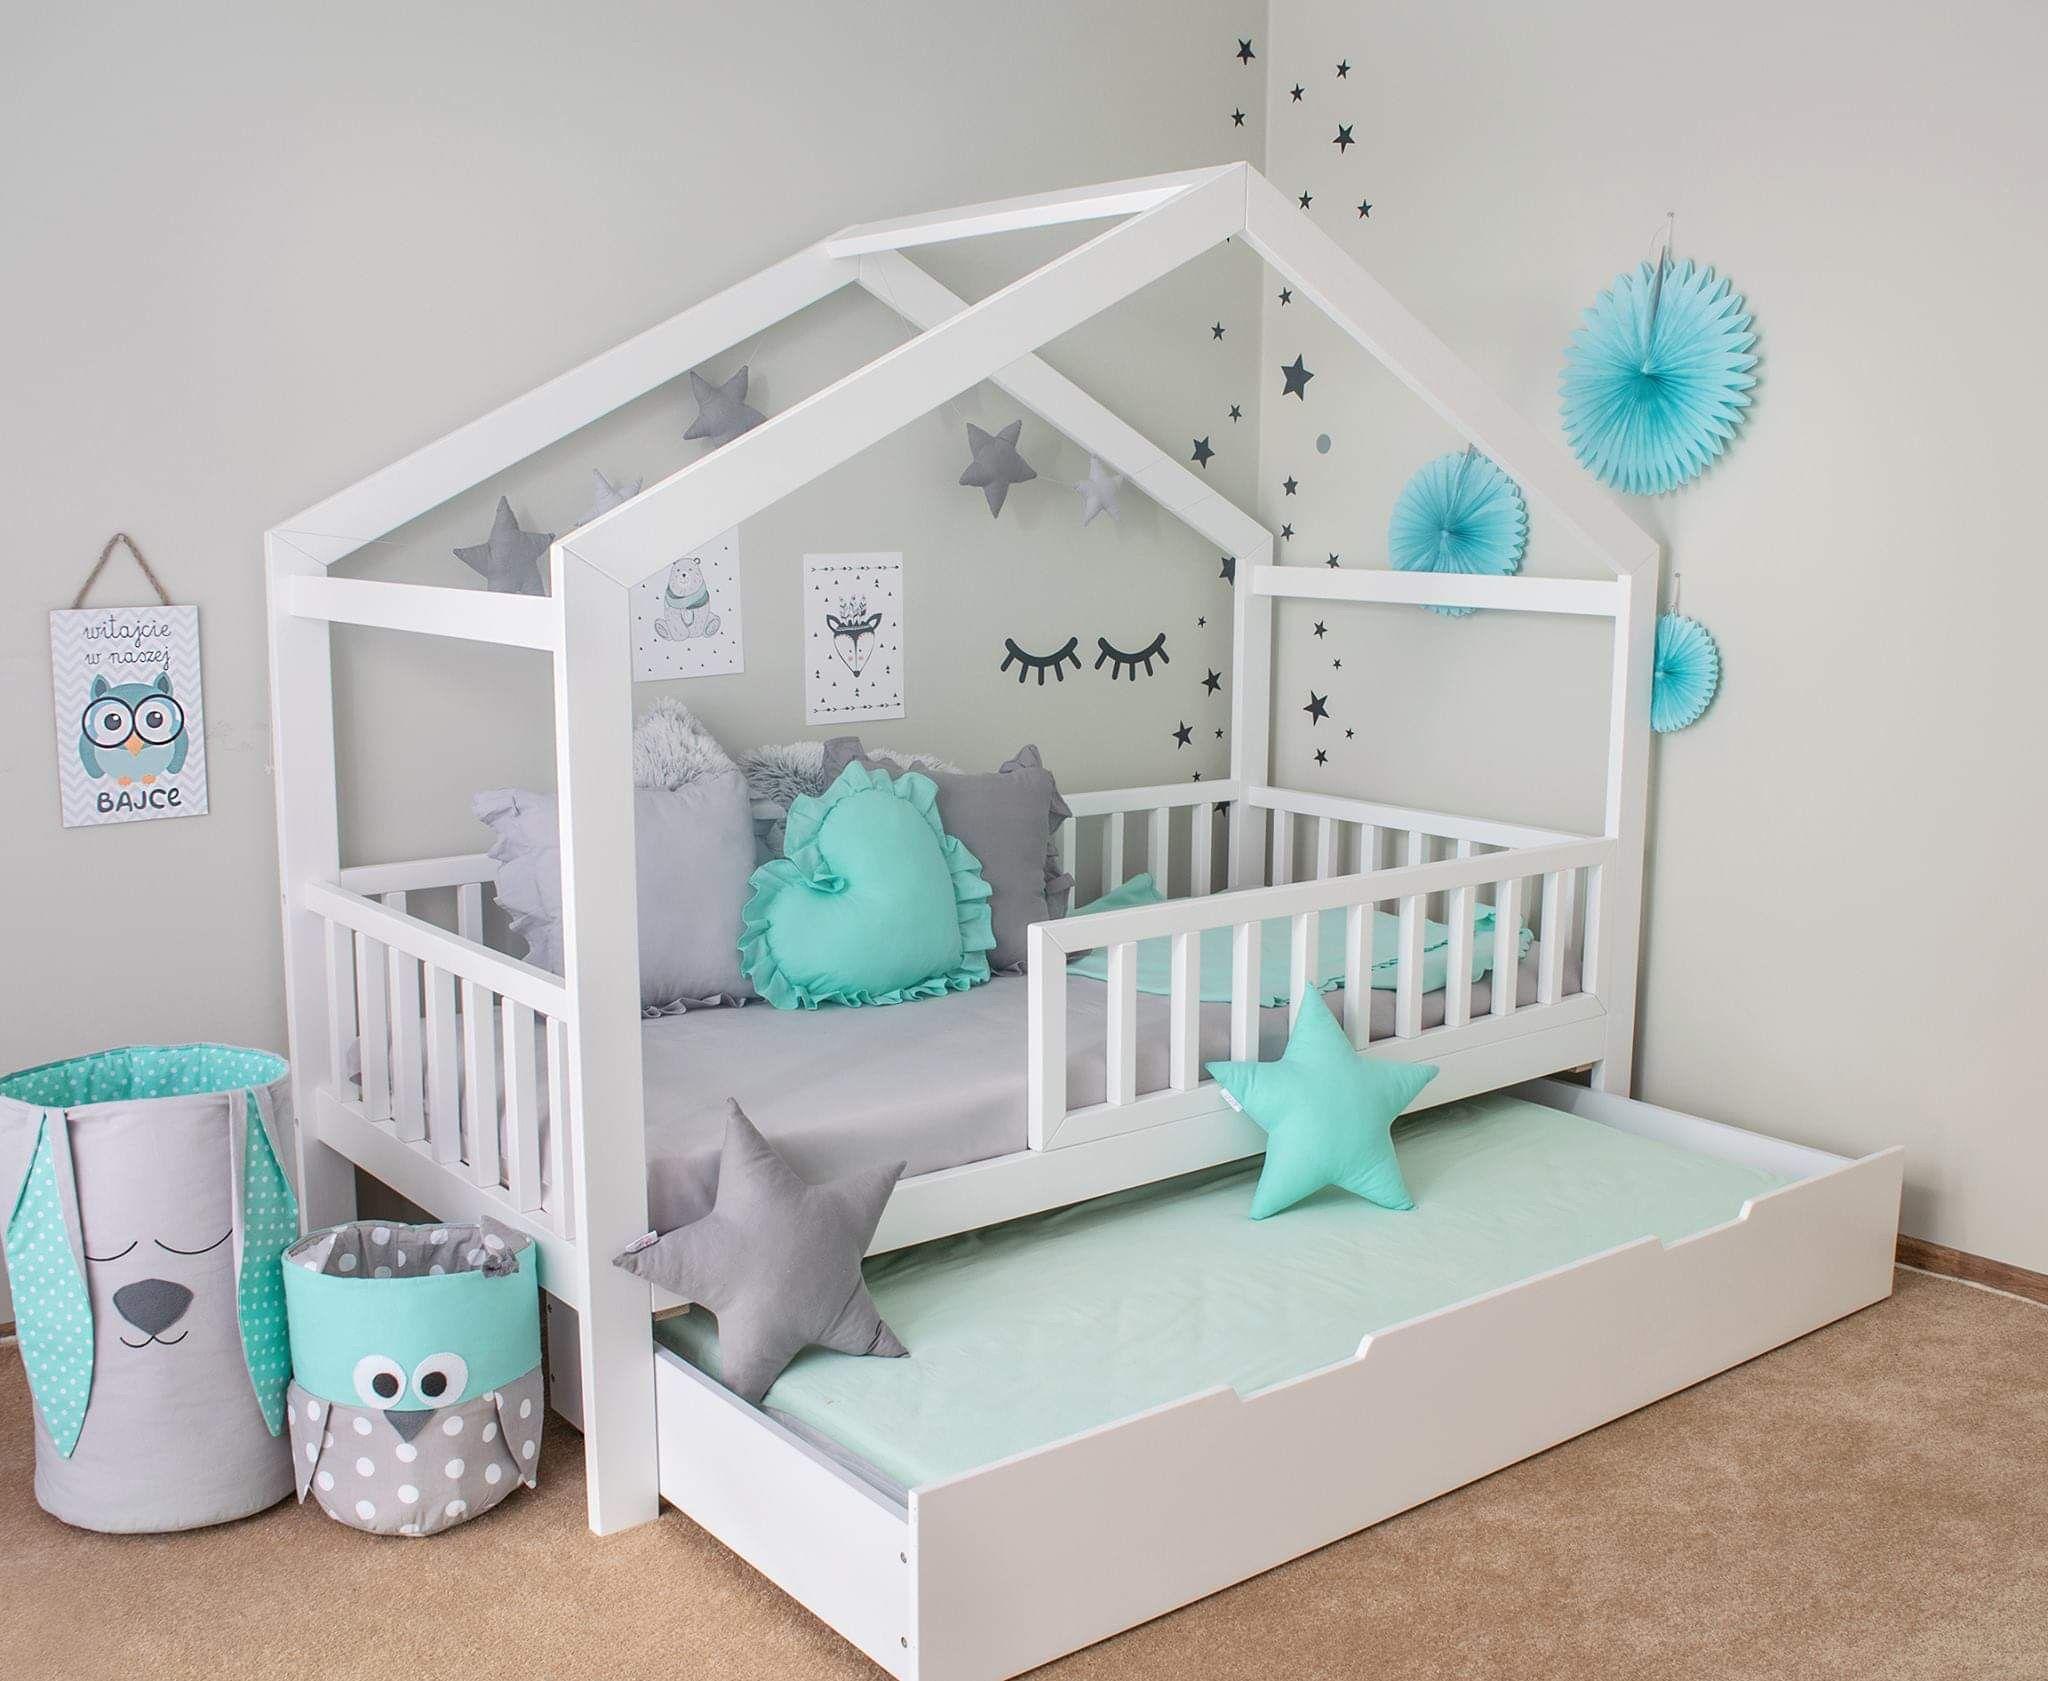 Hausbett mit schublade Kopenhagen PLUS – Kinderbett